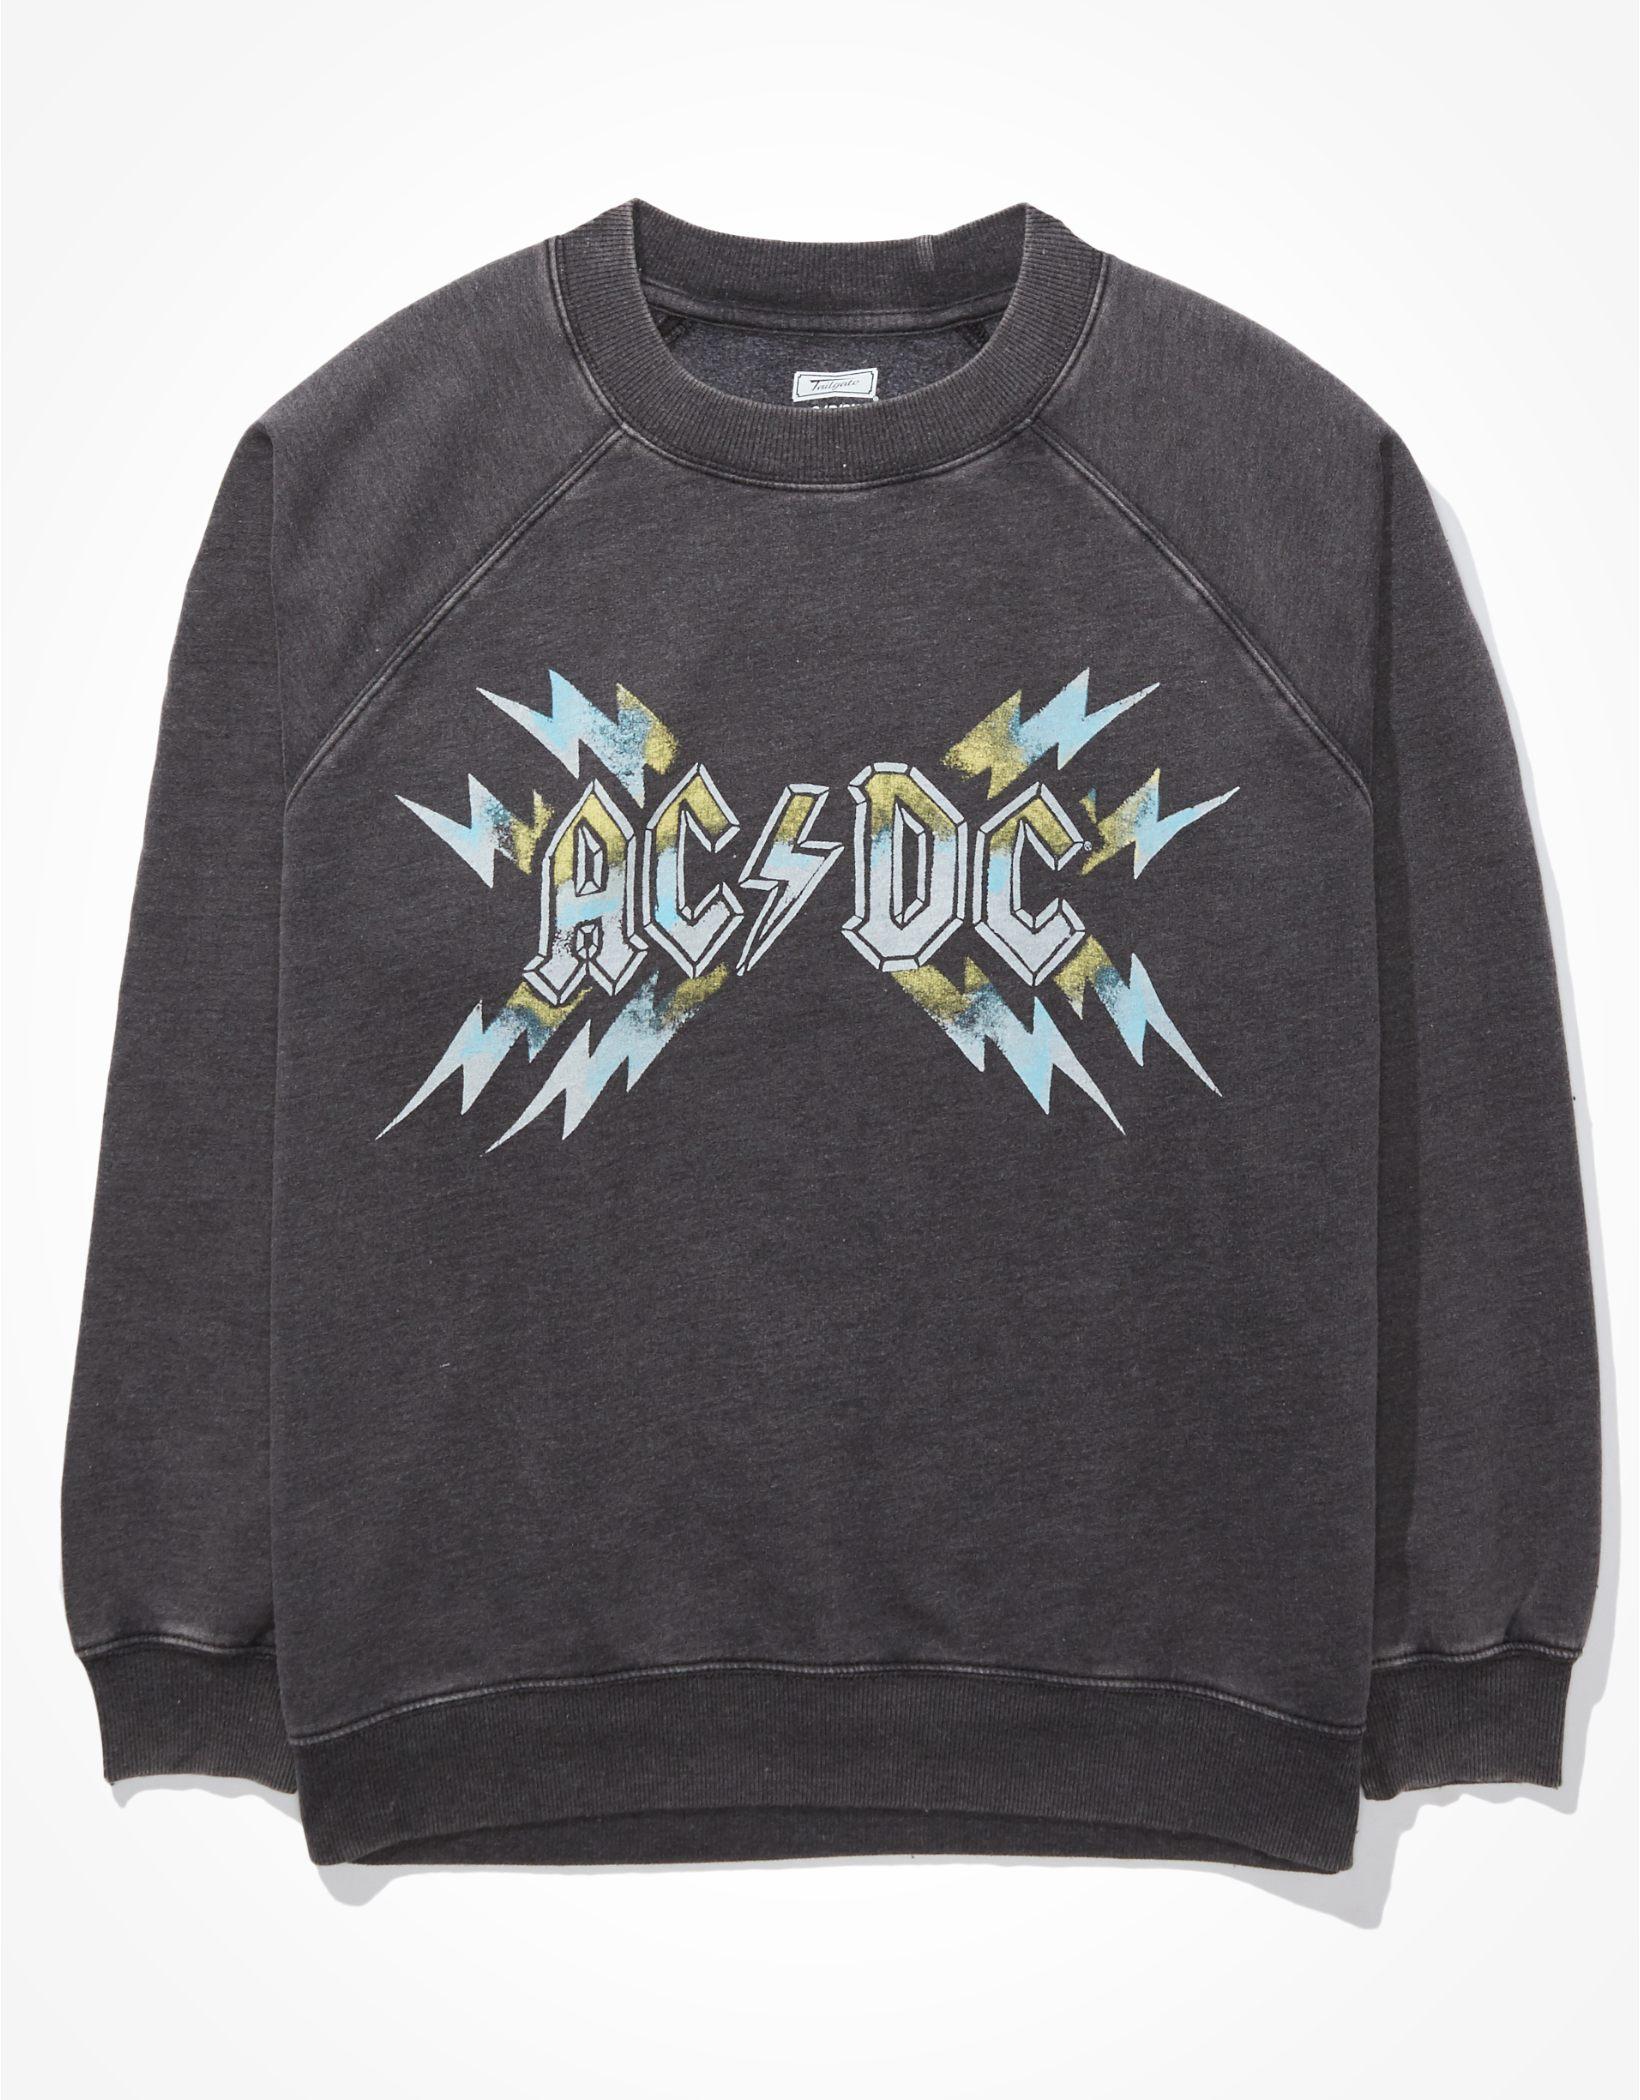 Tailgate Women's ACDC Graphic Fleece Sweatshirt